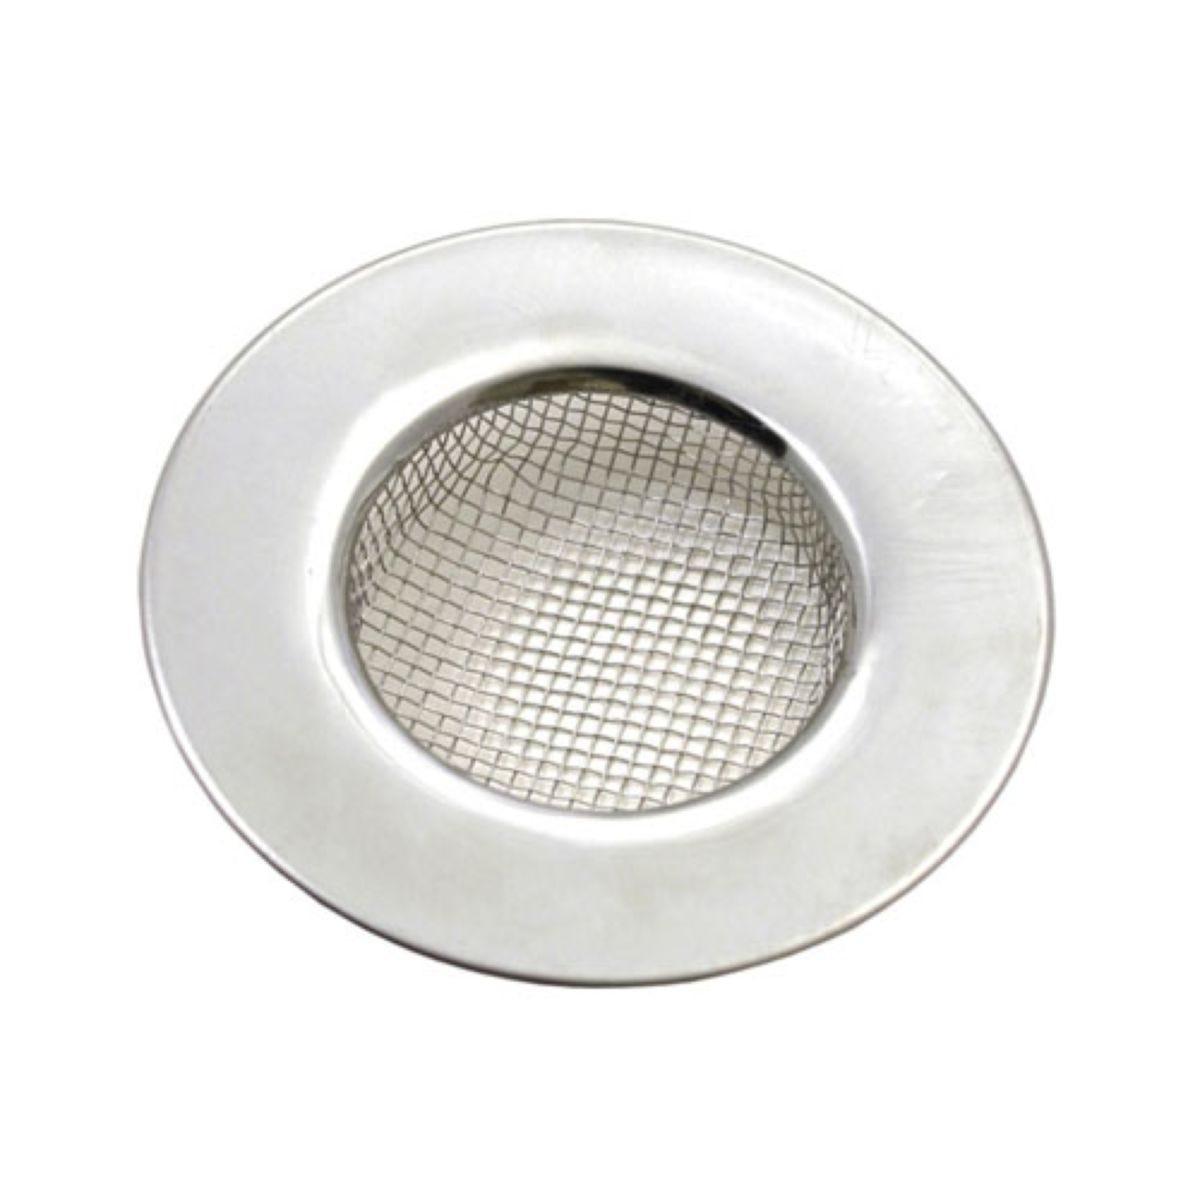 Tala Stainless Steel Mini Sink Strainer